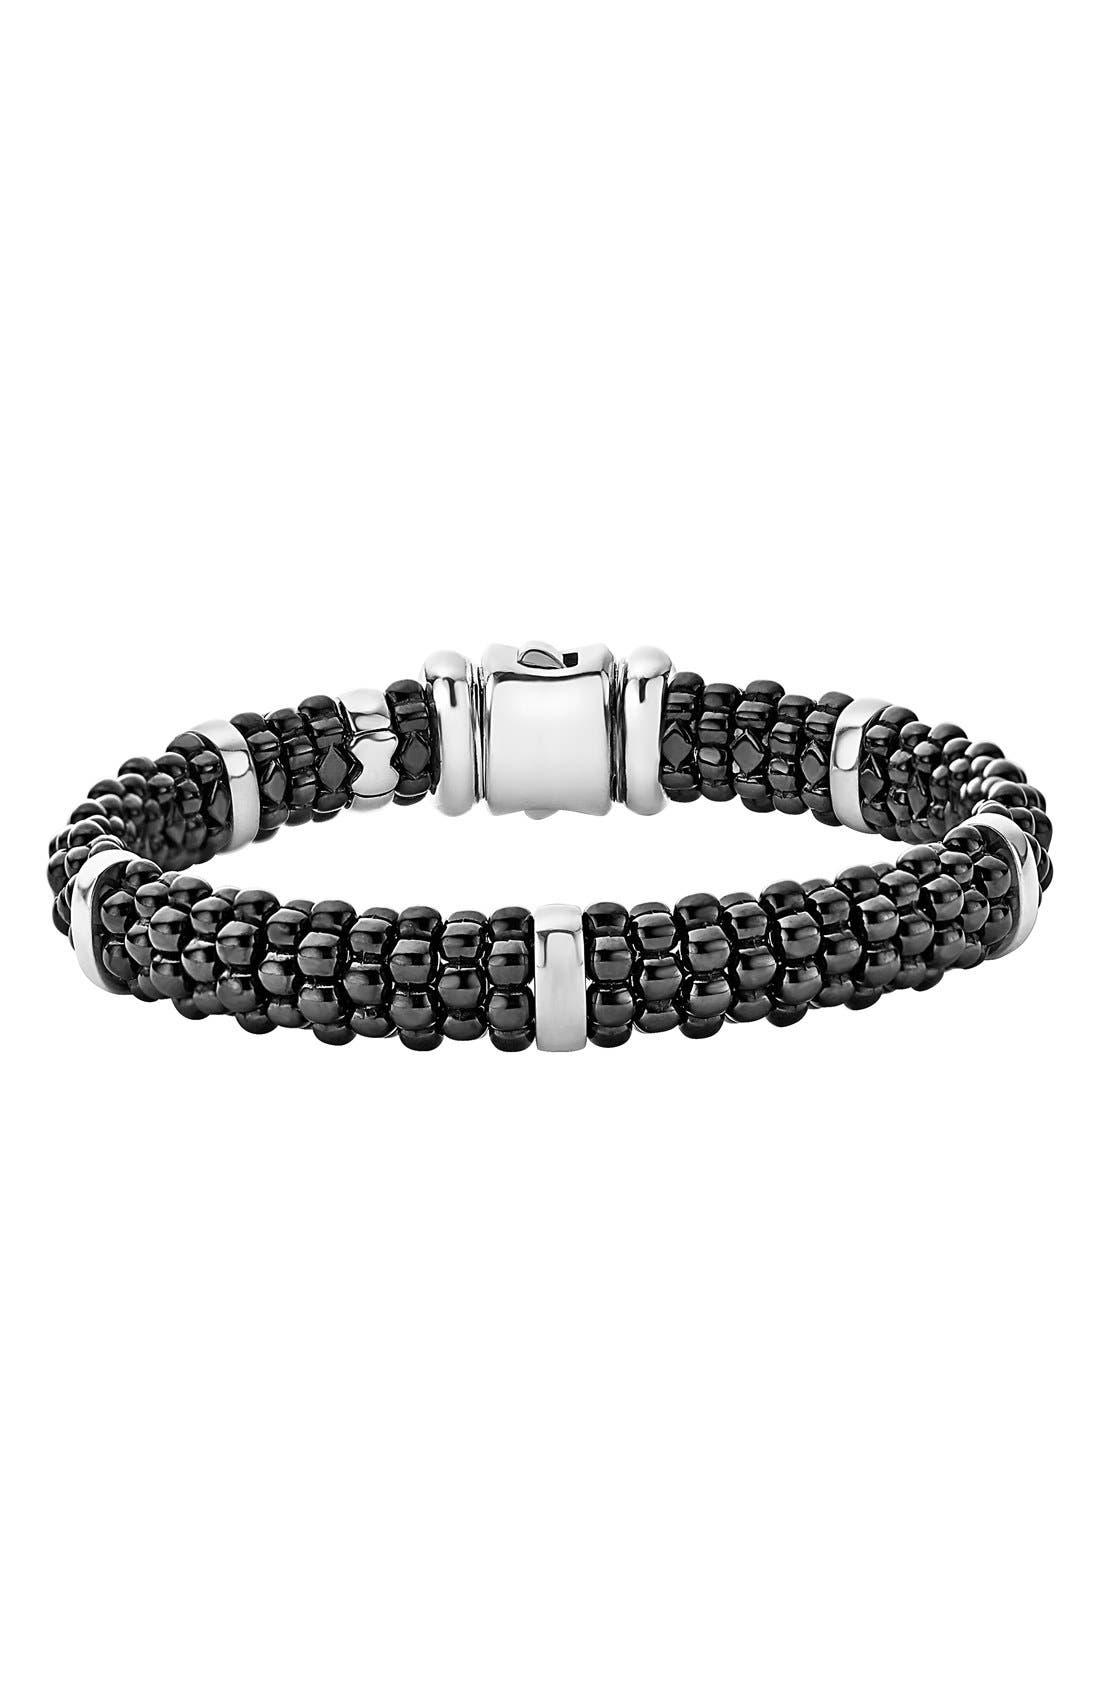 Main Image - LAGOS Black Caviar Station Bracelet